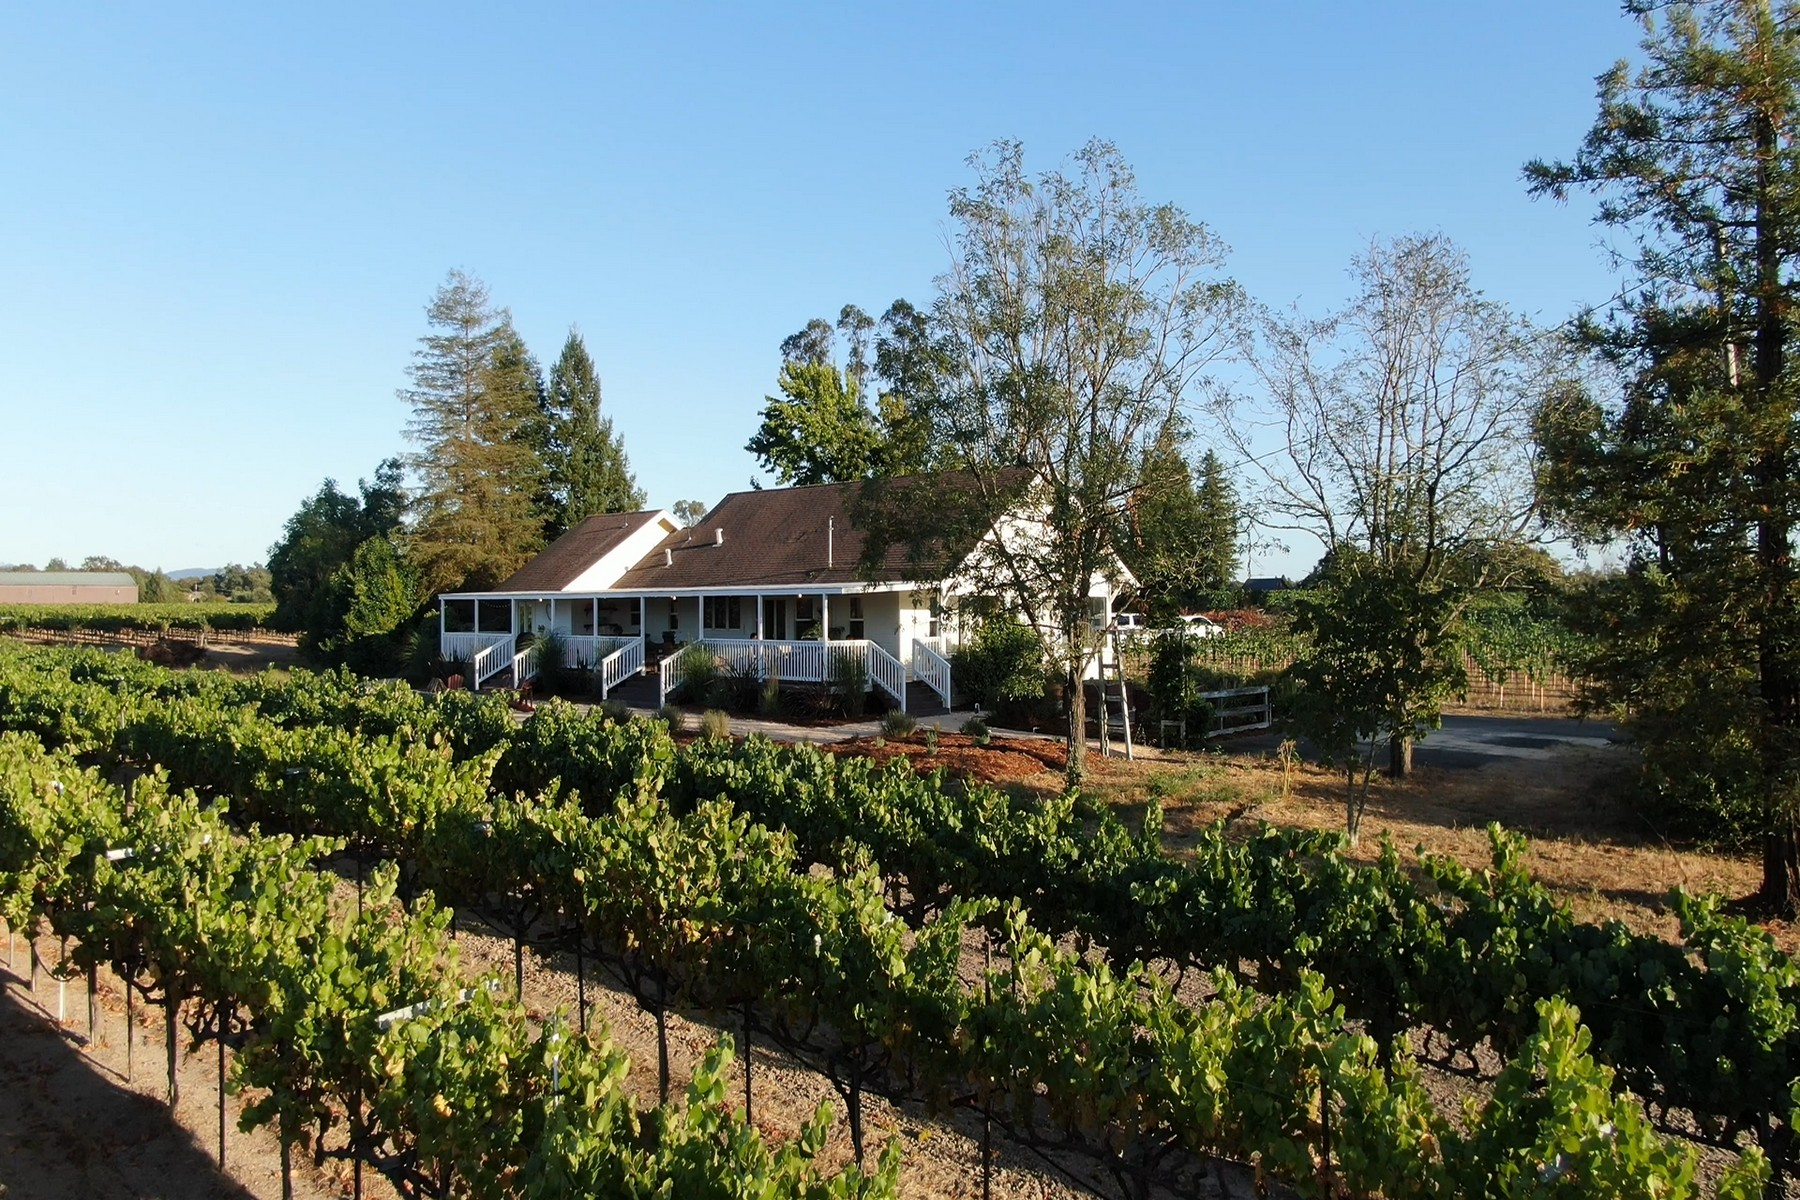 Single Family Homes for Active at Olivet Vineyard Farmhouse 2040 Olivet Road Santa Rosa, California 95404 United States